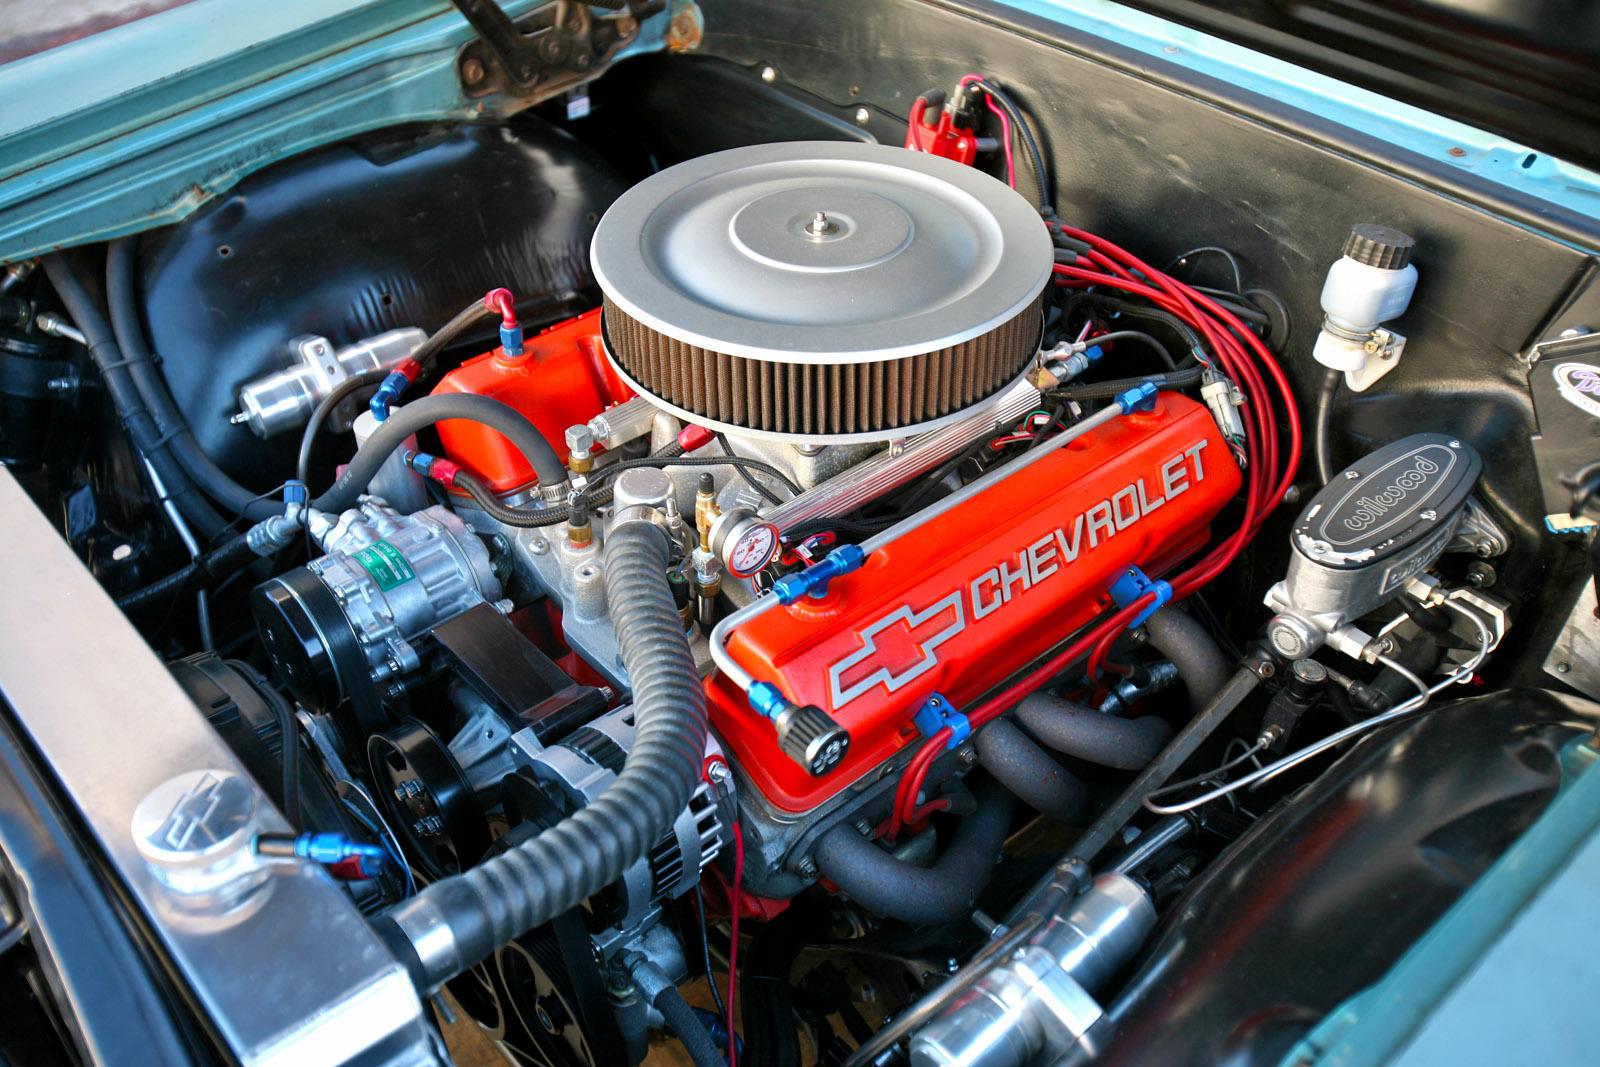 Chevrolet small-block cast aluminum valve cover